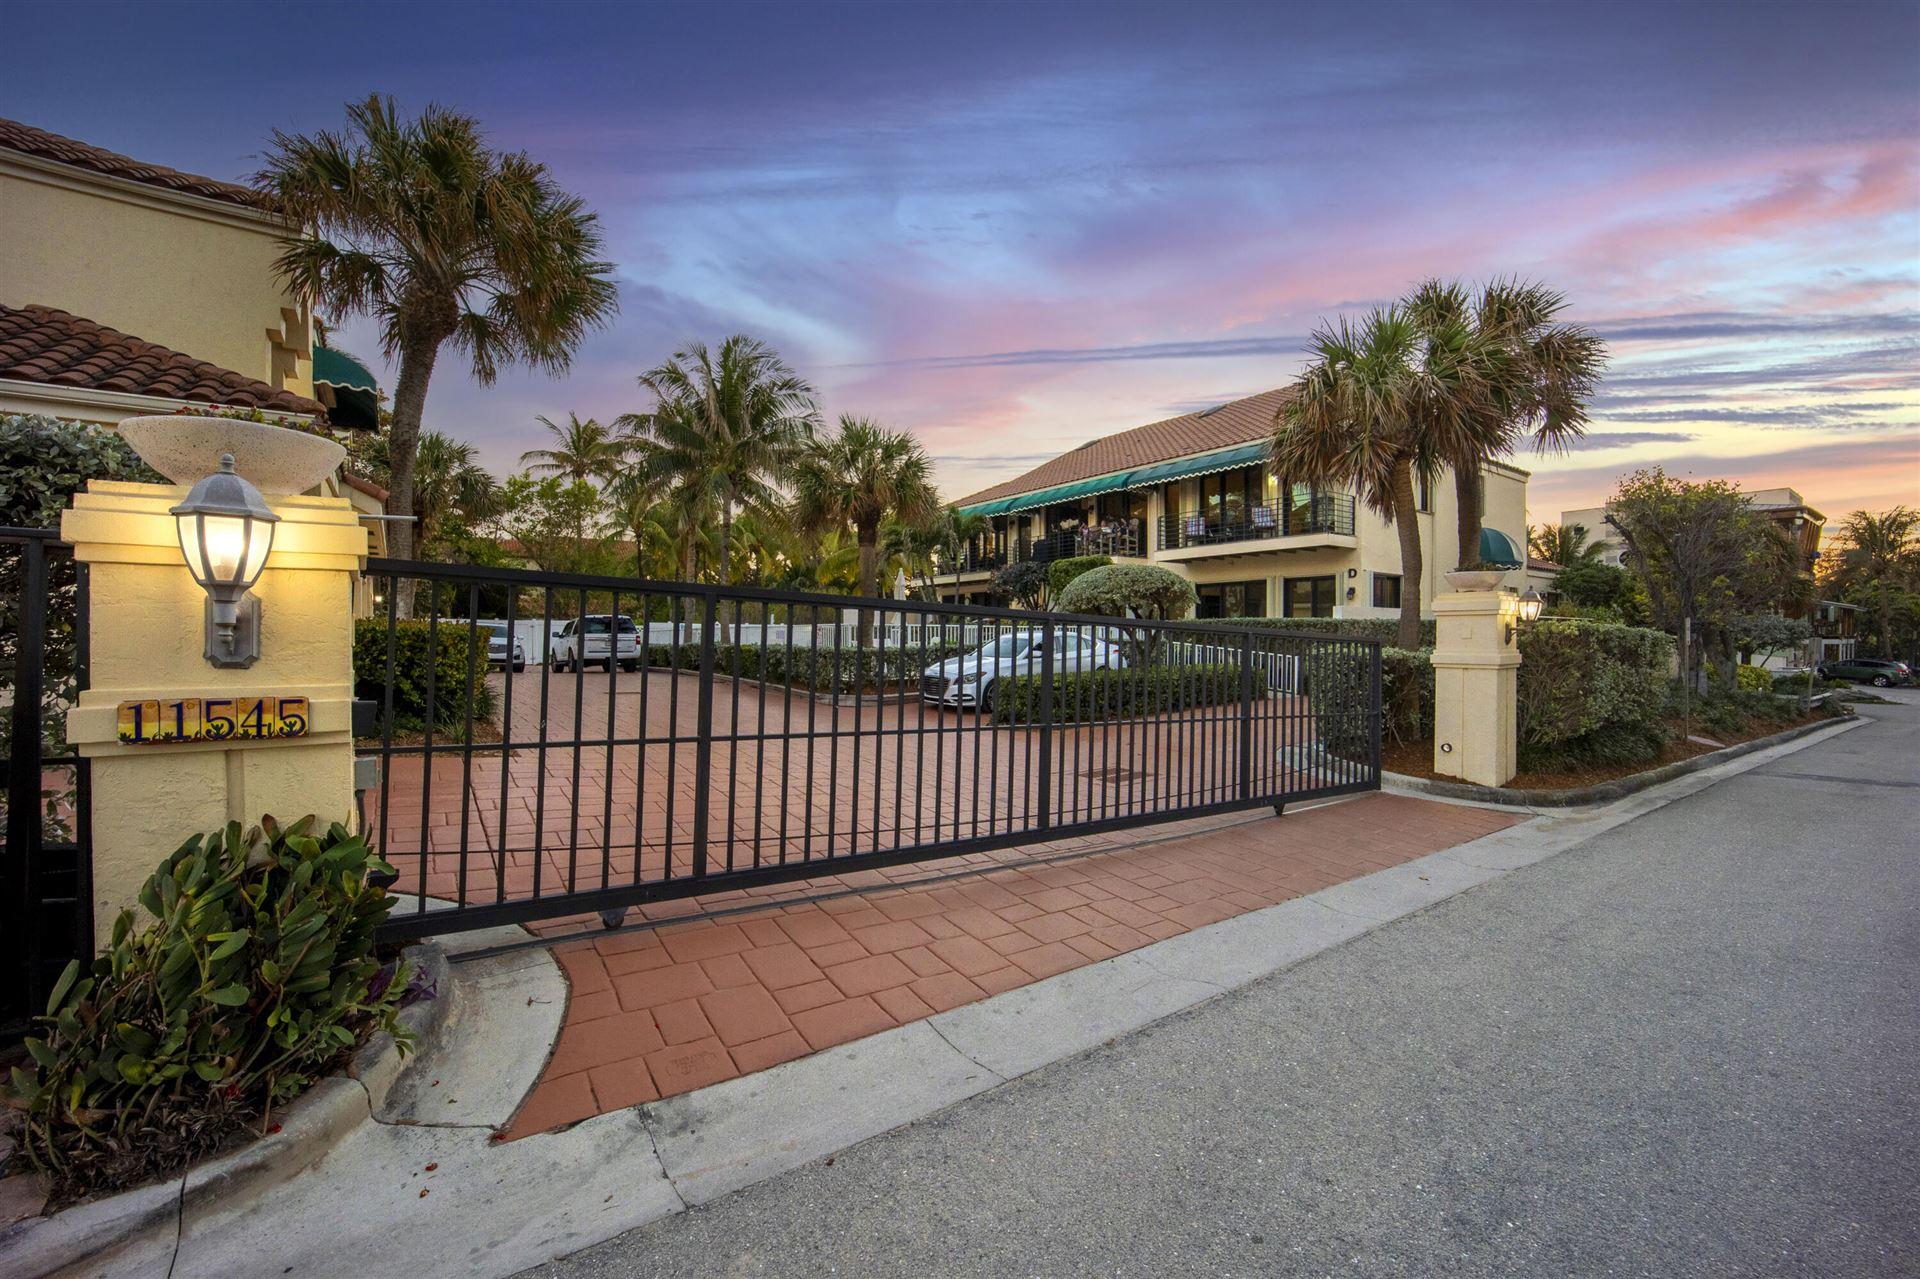 11545 NW Old Ocean Boulevard #D, Boynton Beach, FL 33435 - #: RX-10647322